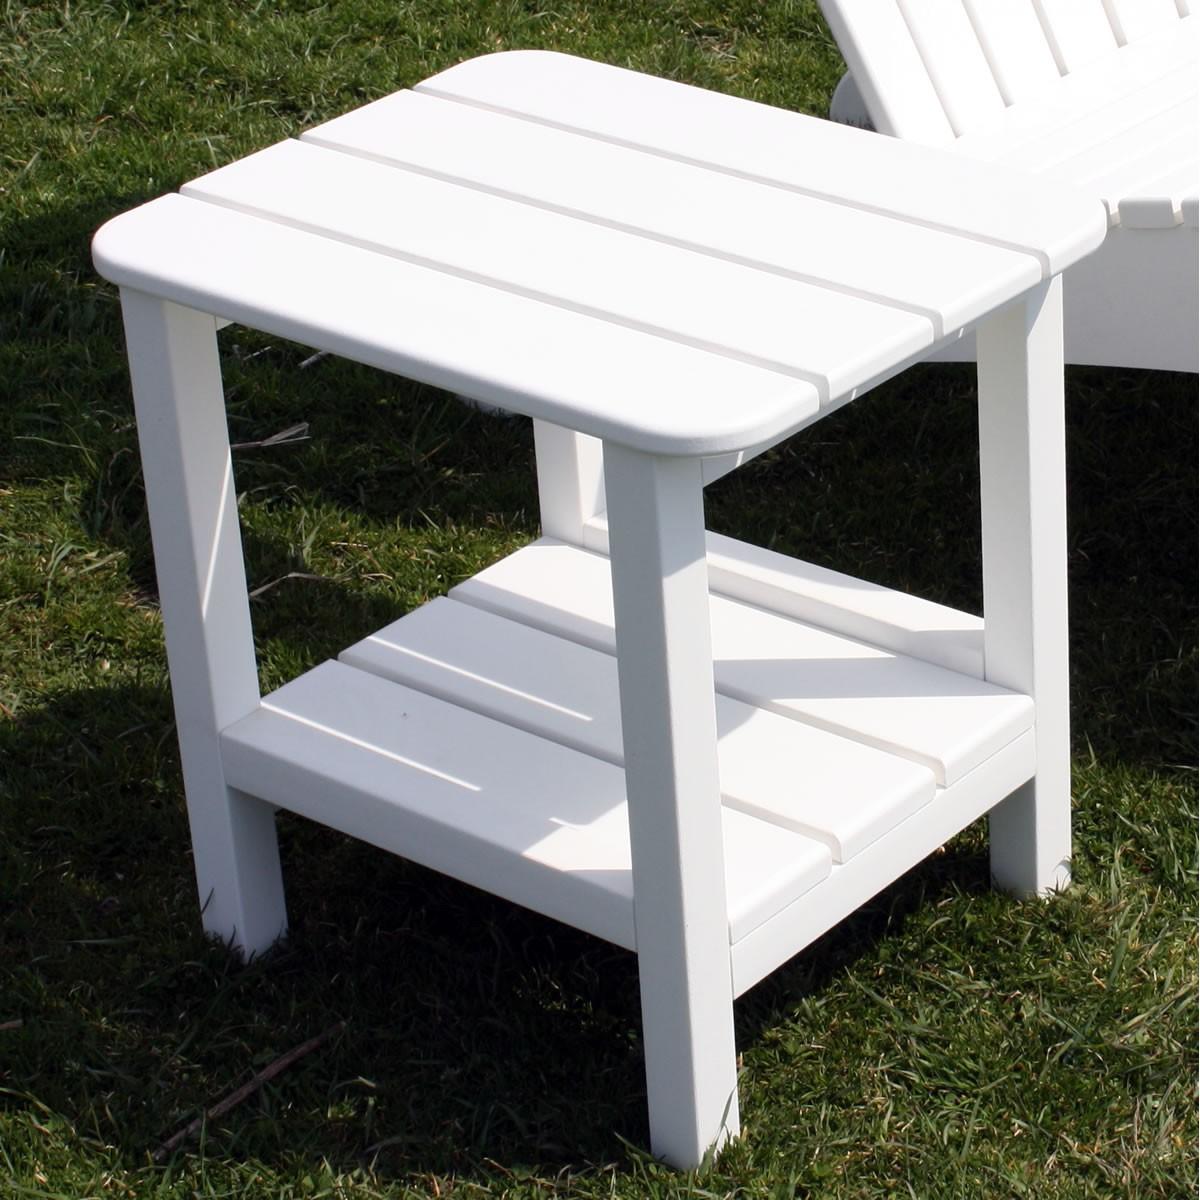 Malibu Outdoor Rectangular End Table 15 X 19 Inch